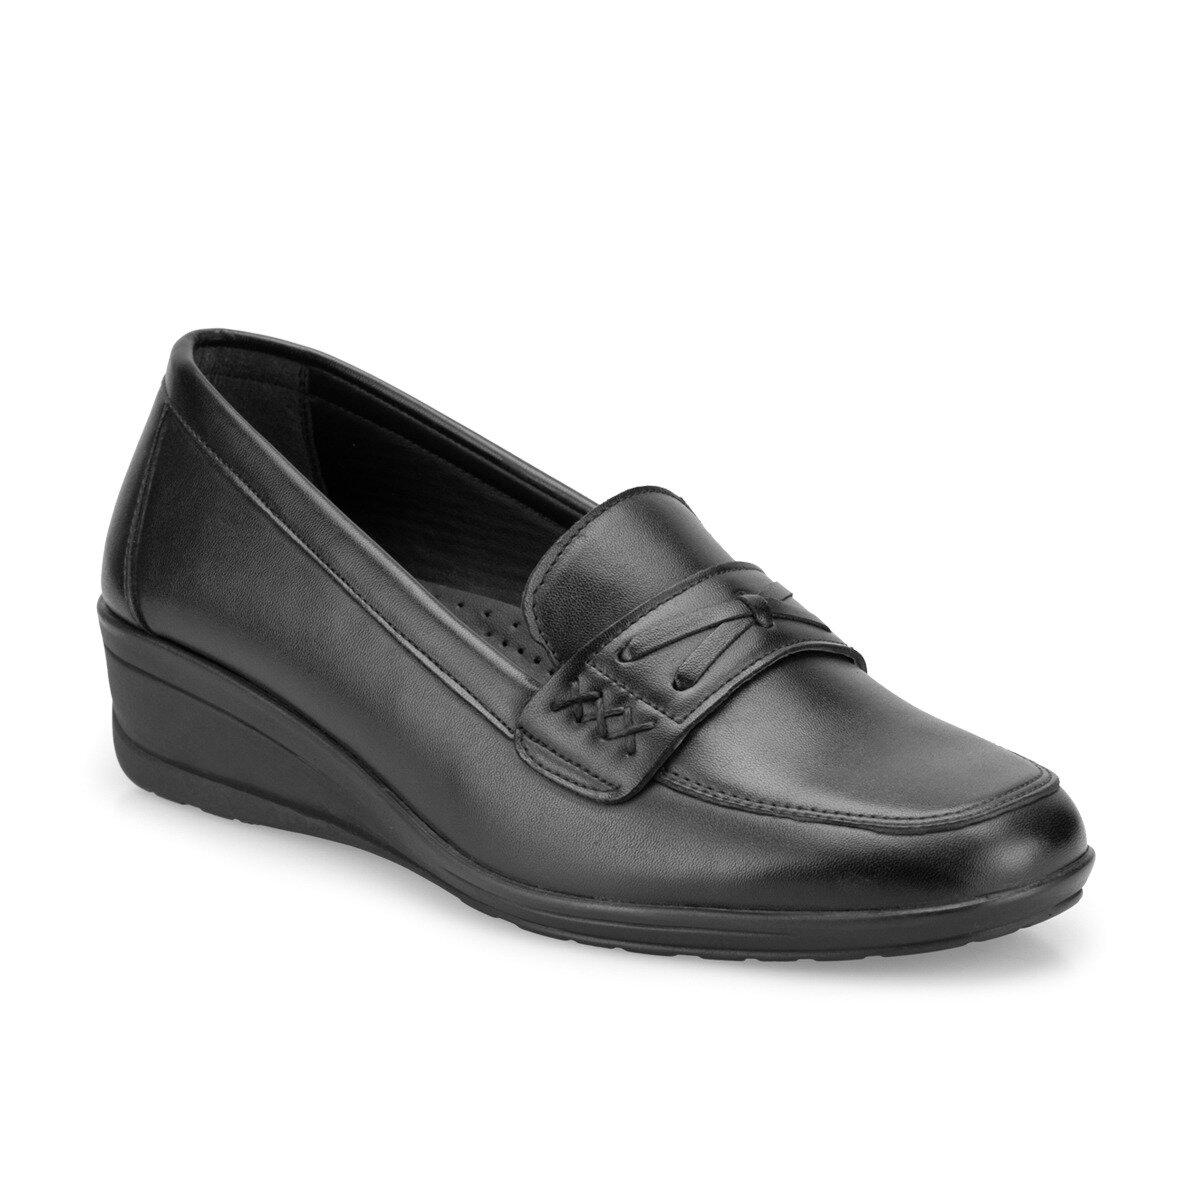 FLO 161059.Z Black Women Shoes Polaris